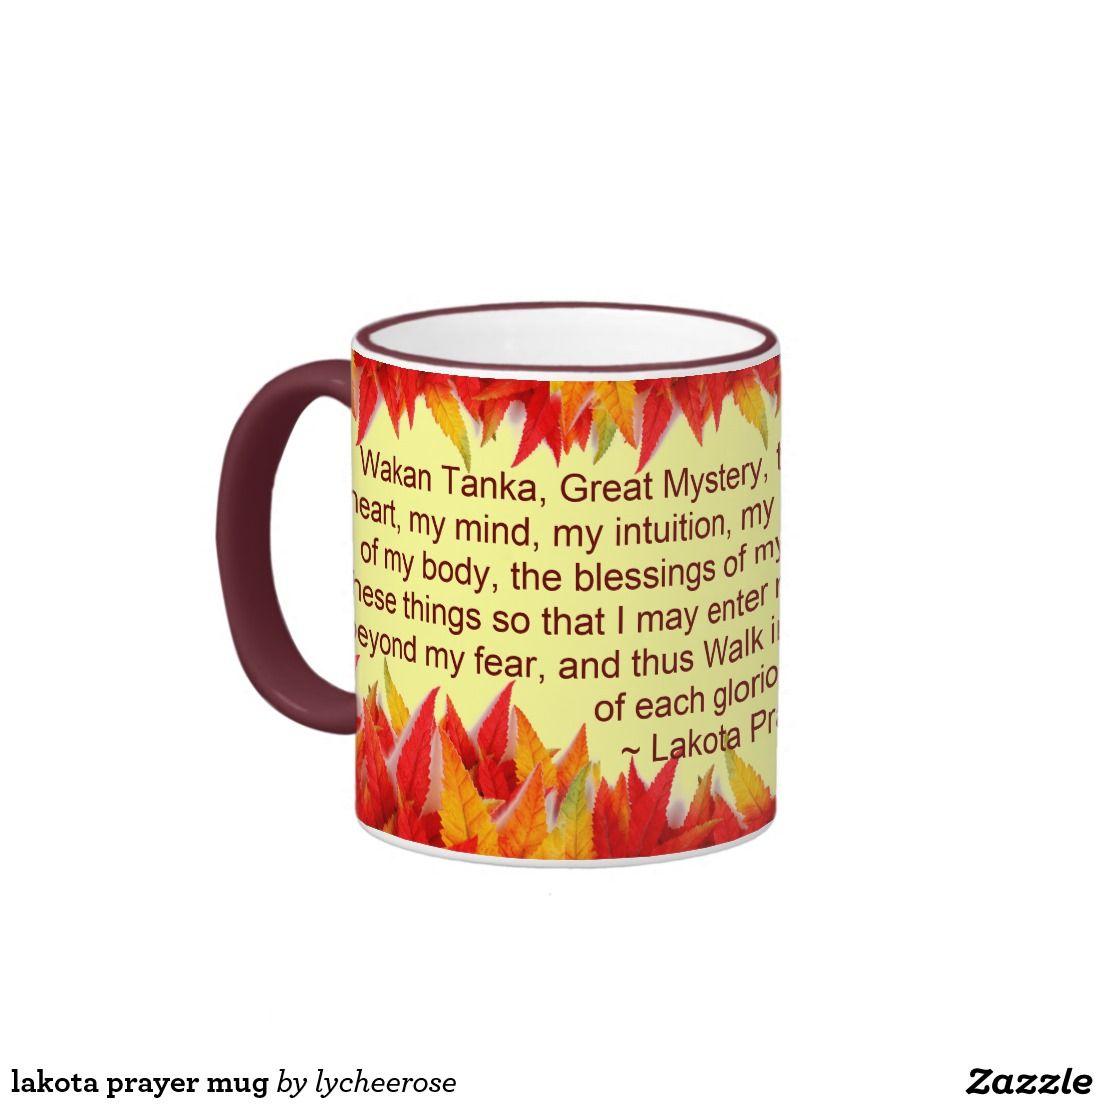 Prayer Mugs - No Minimum Quantity   Zazzle